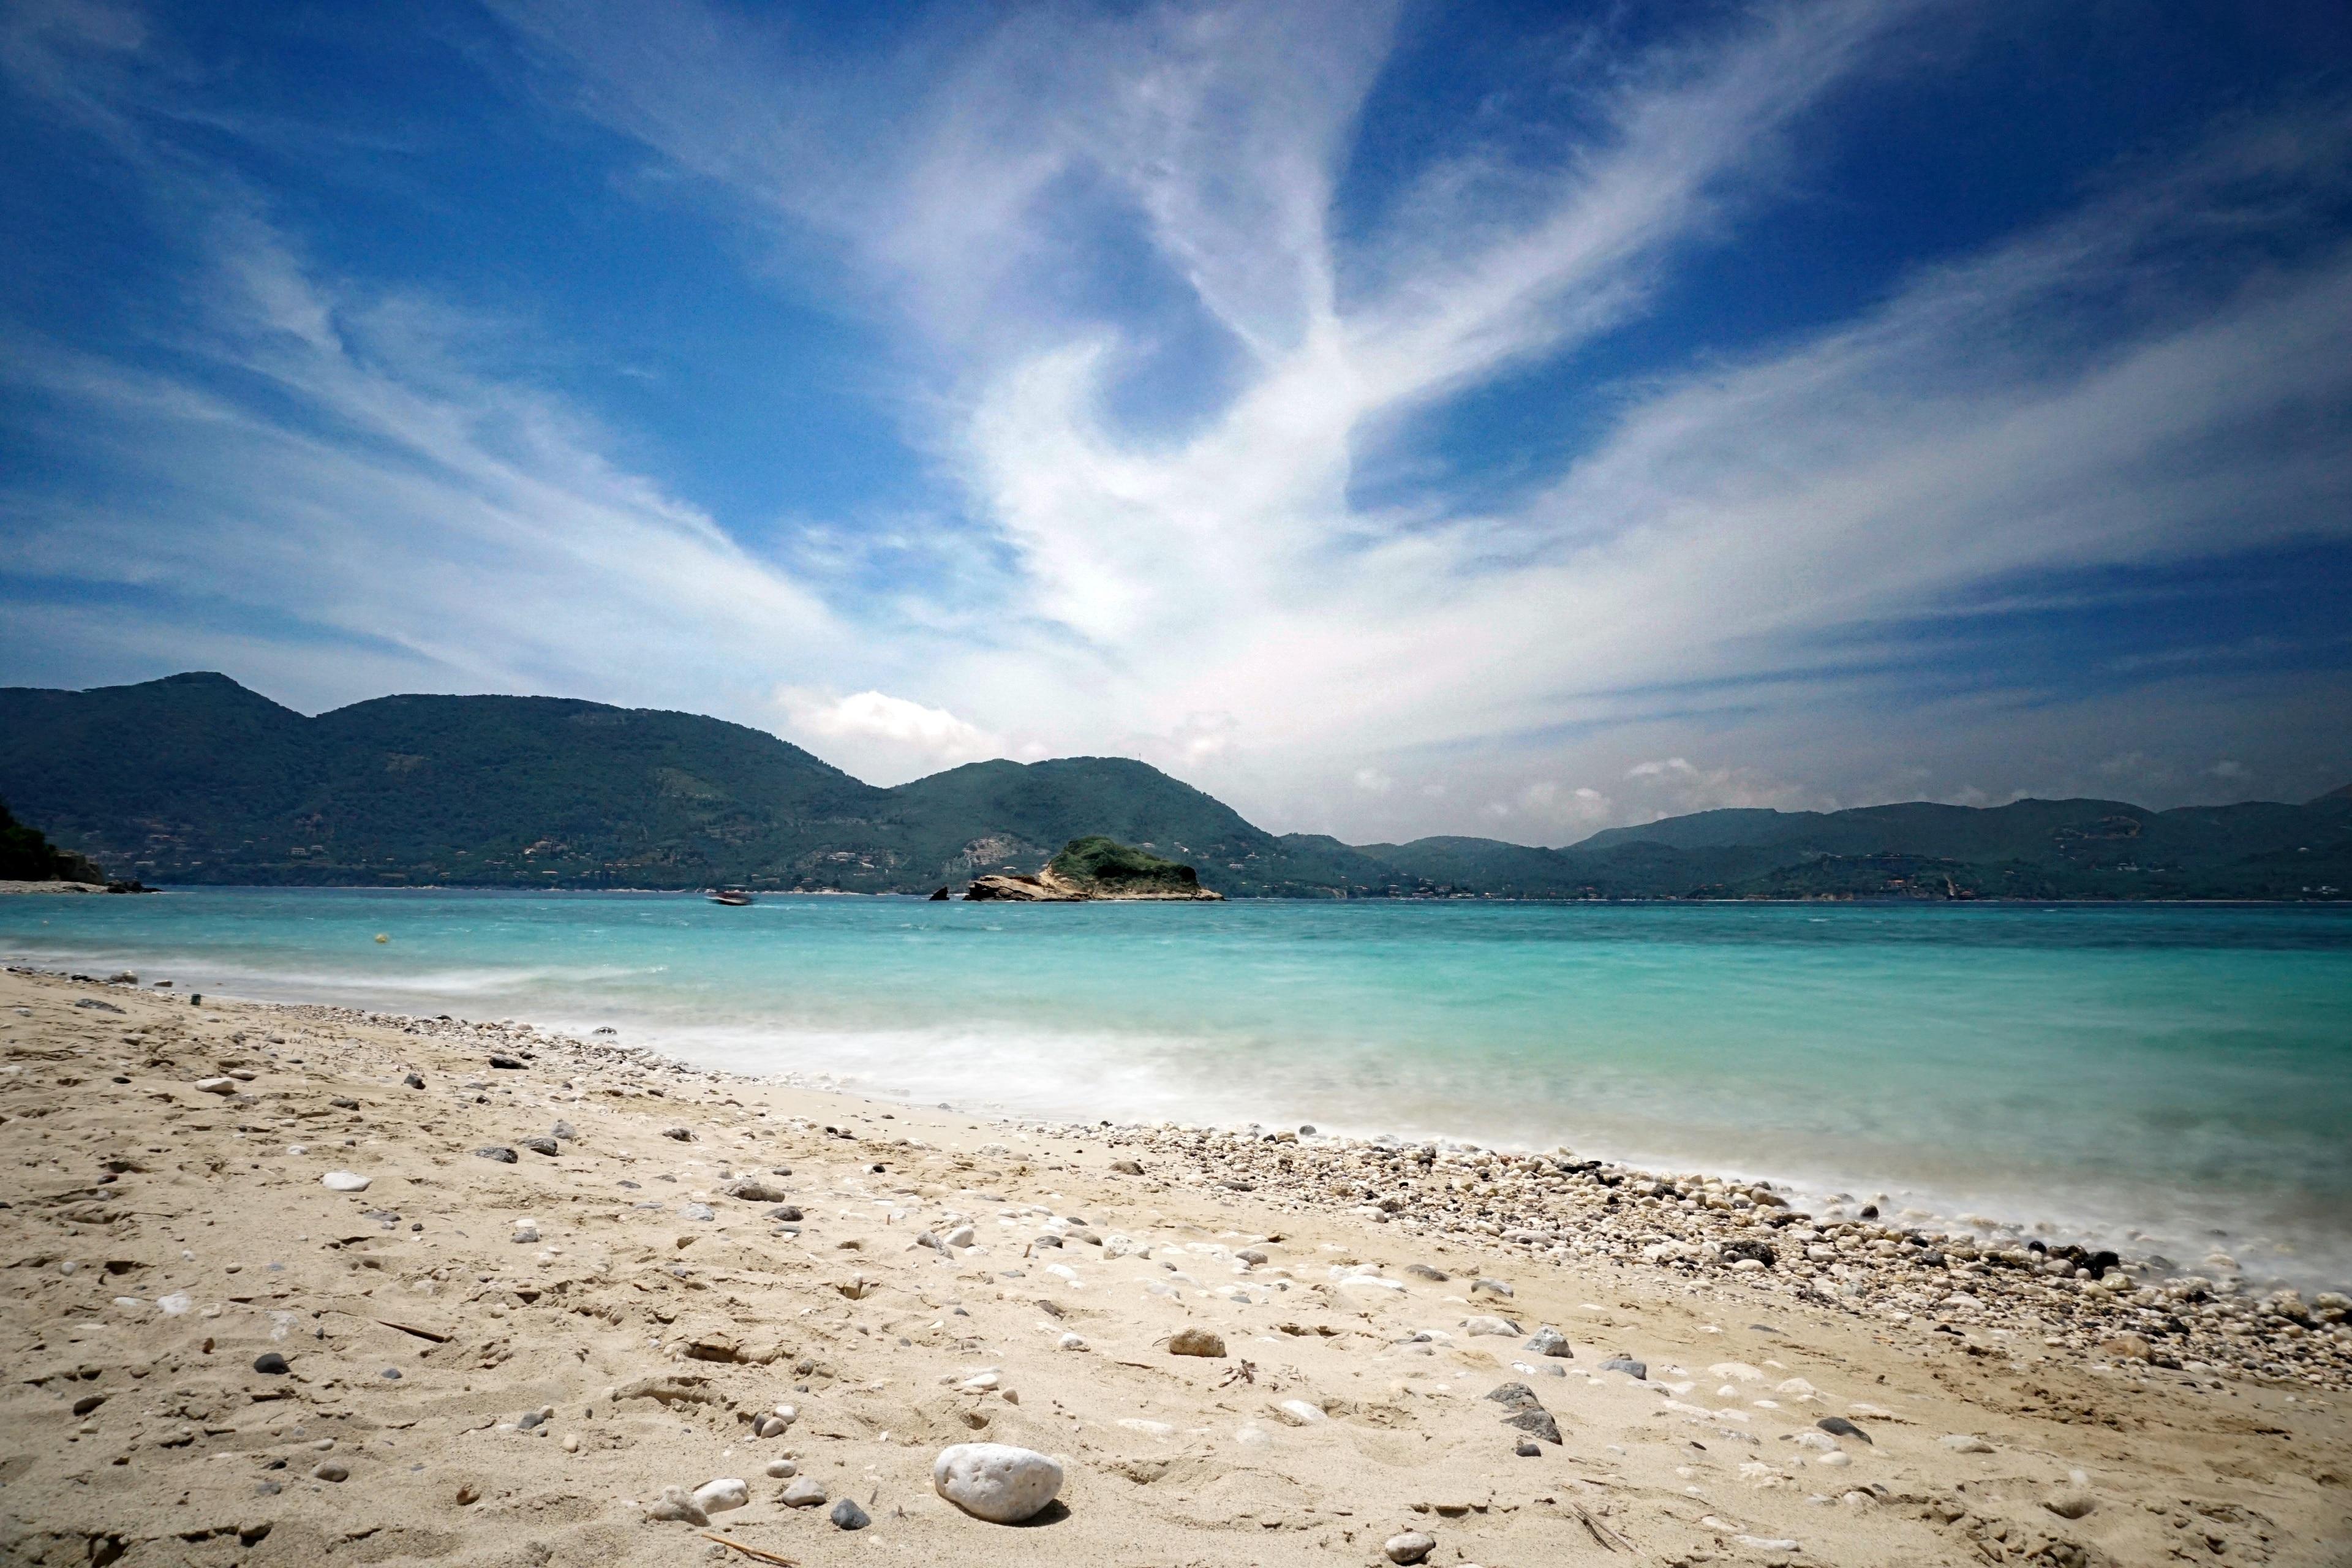 Laganas, Zakynthos, Ionian Islands Region, Greece